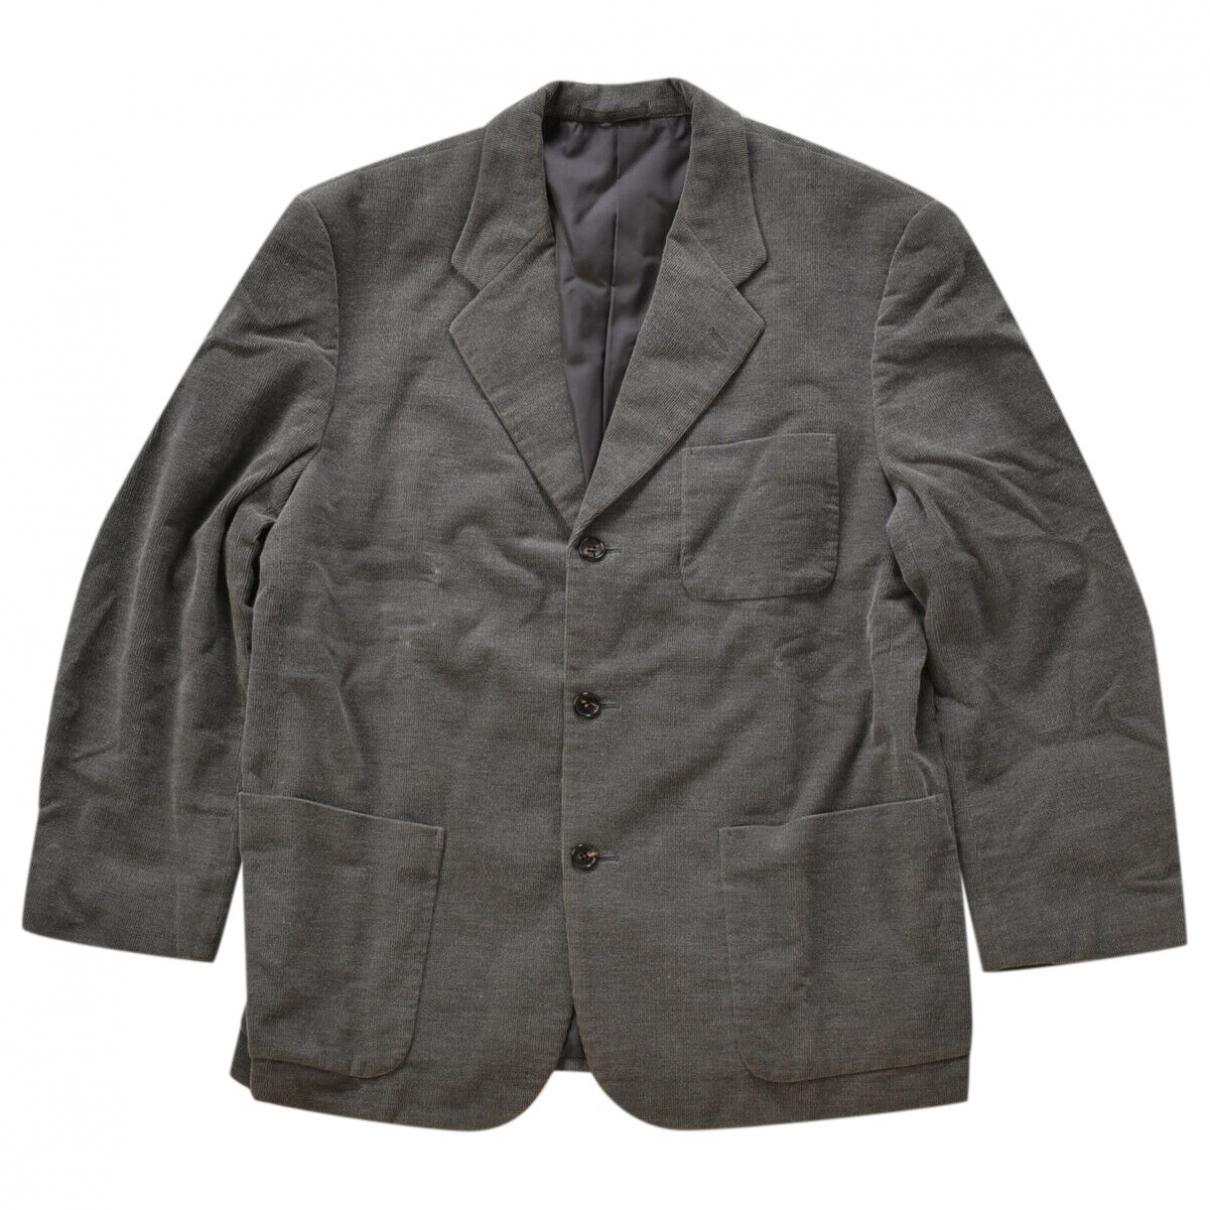 Comme Des Garcons \N Grey Cotton jacket  for Men M International